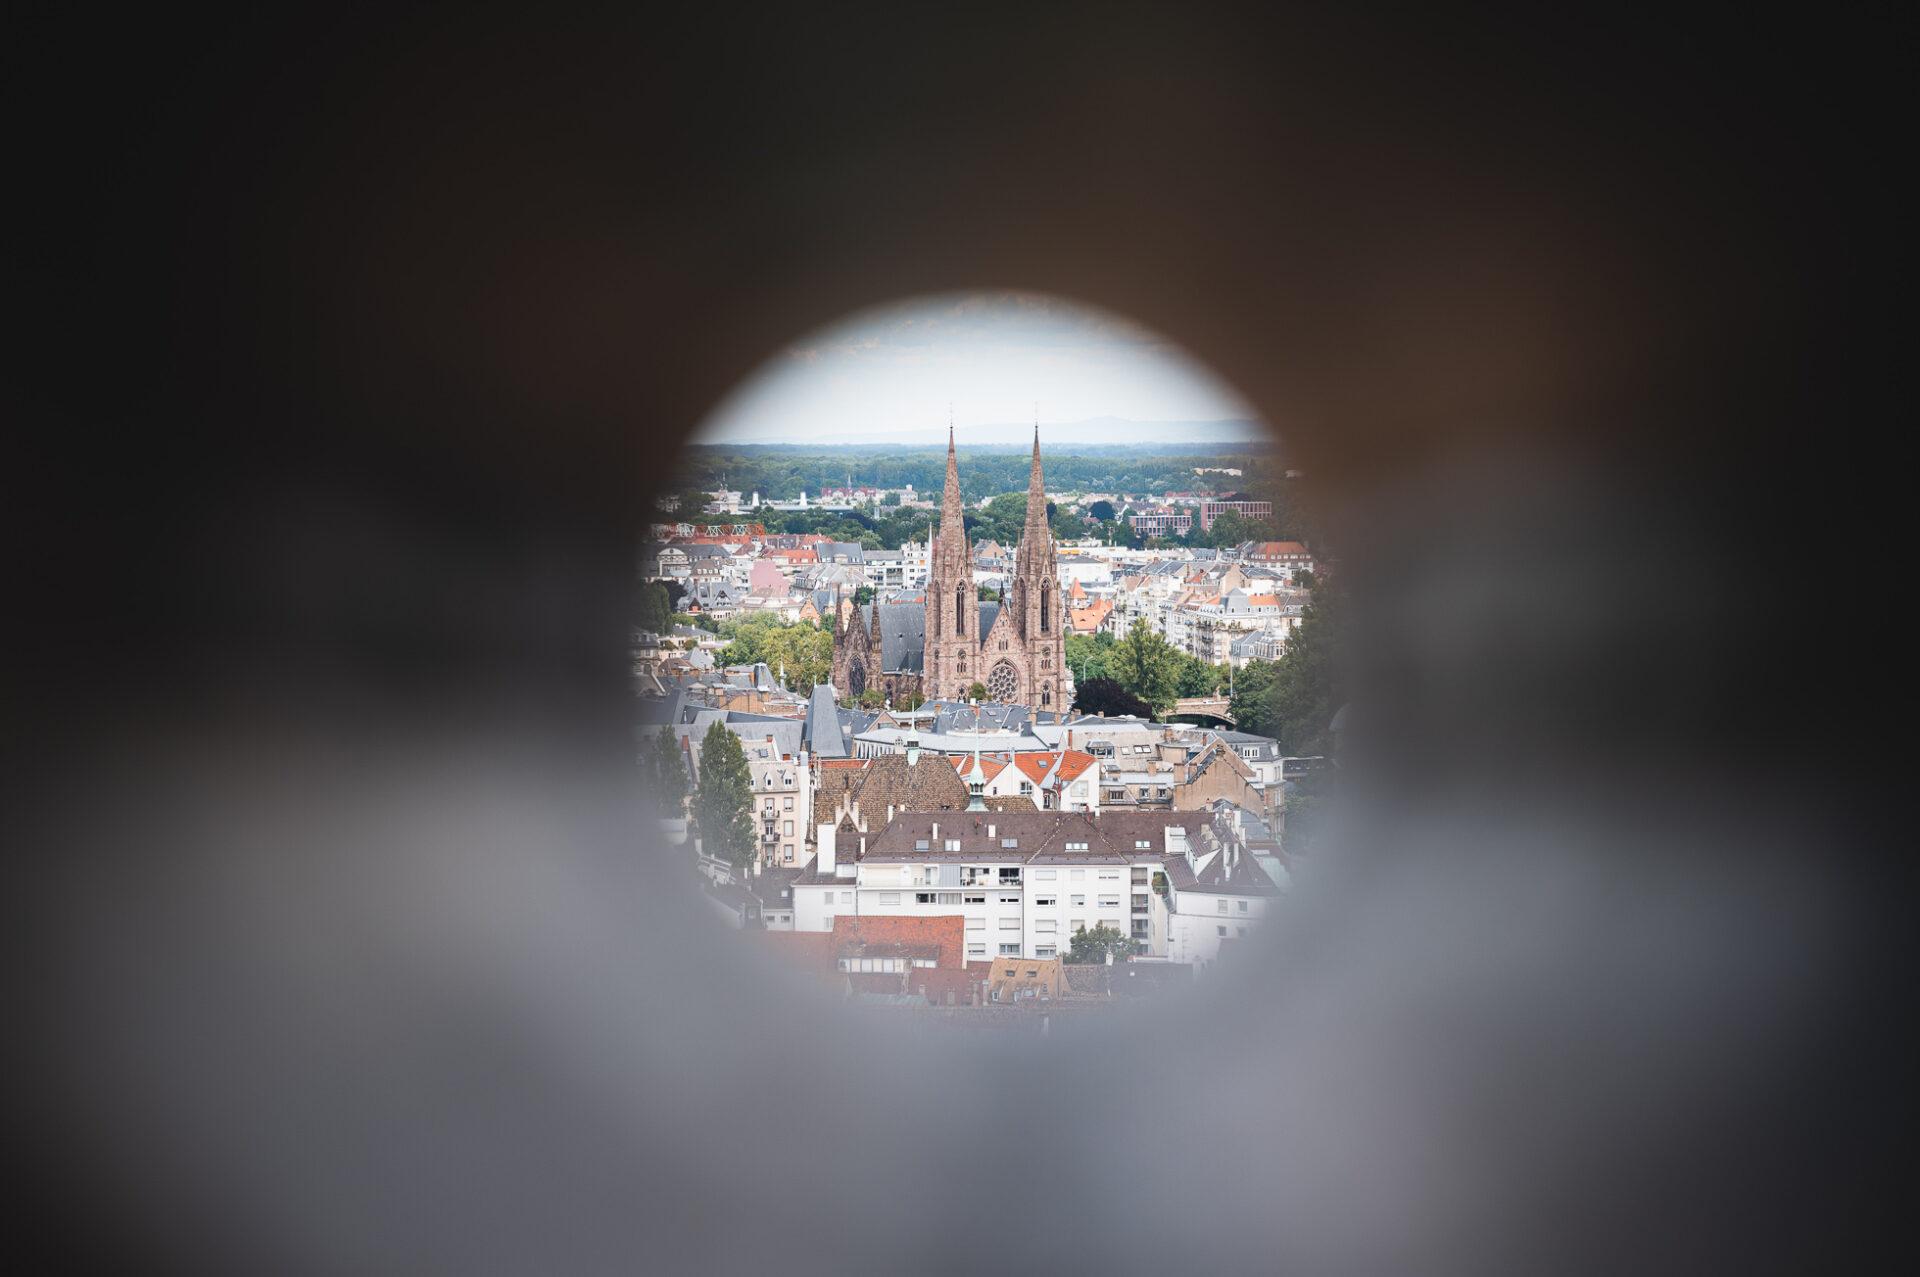 strasbourg 1488 - Les globe blogueurs - blog voyage nature